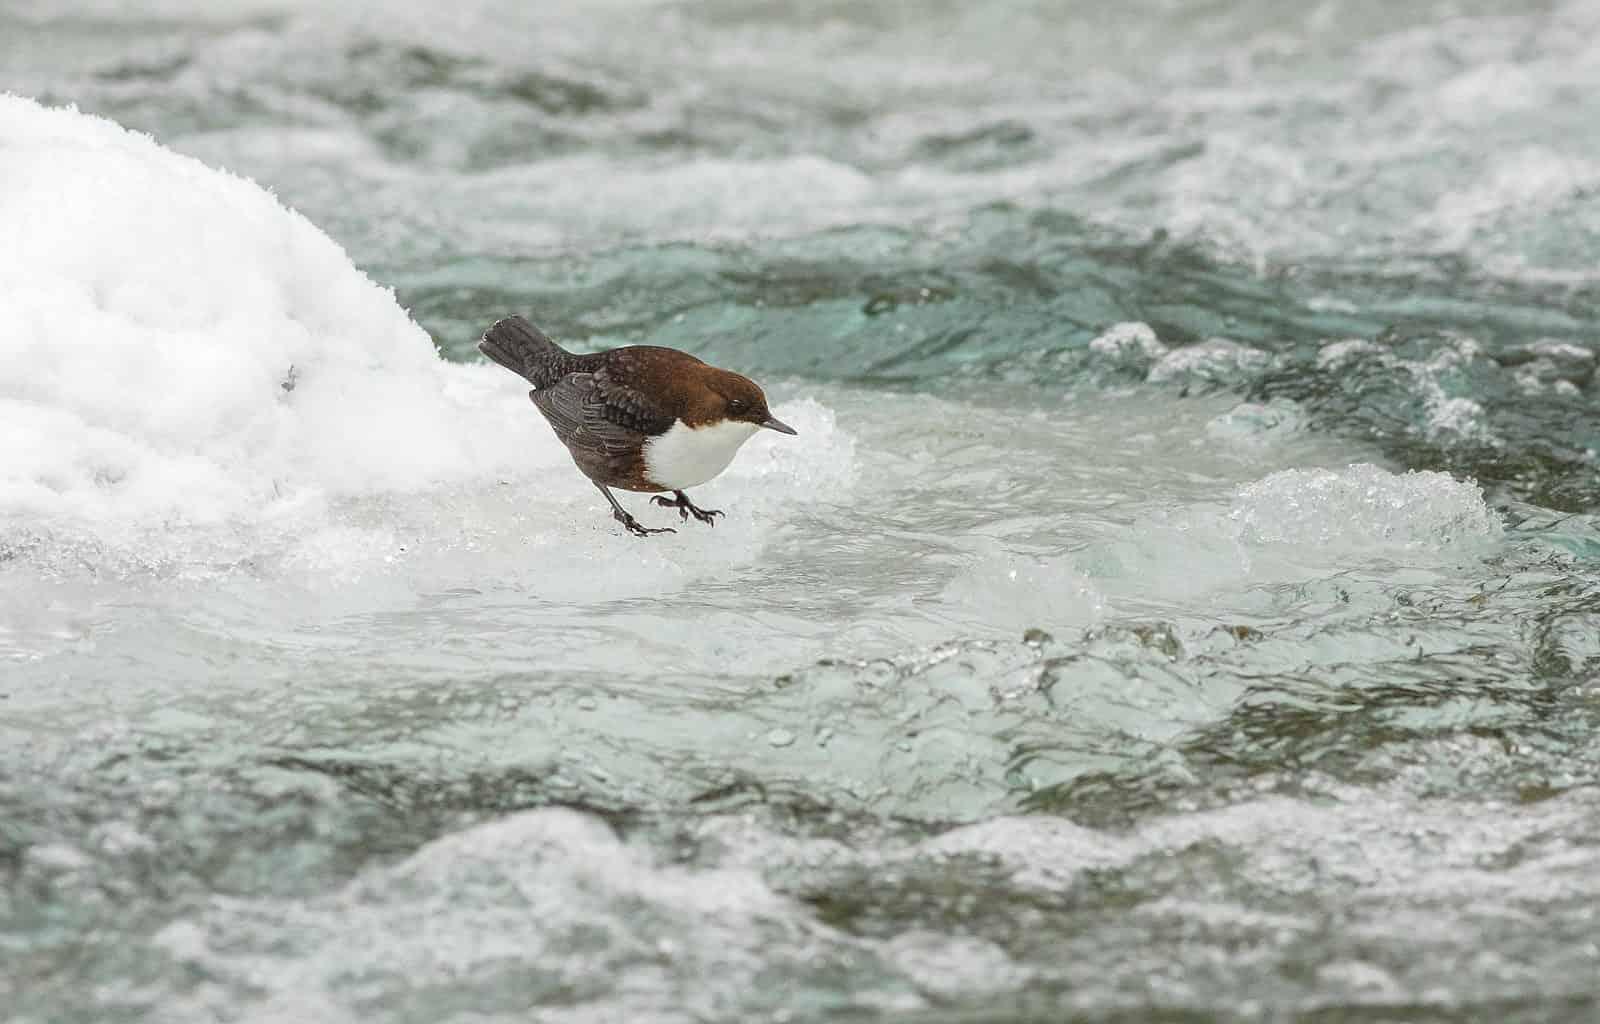 vodnr-poton-si-potravu-vyhadva-na-dne-potokov-a-riek_34765726950_o.jpg - European Wilderness Society - CC NonCommercial-NoDerivates 4.0 International